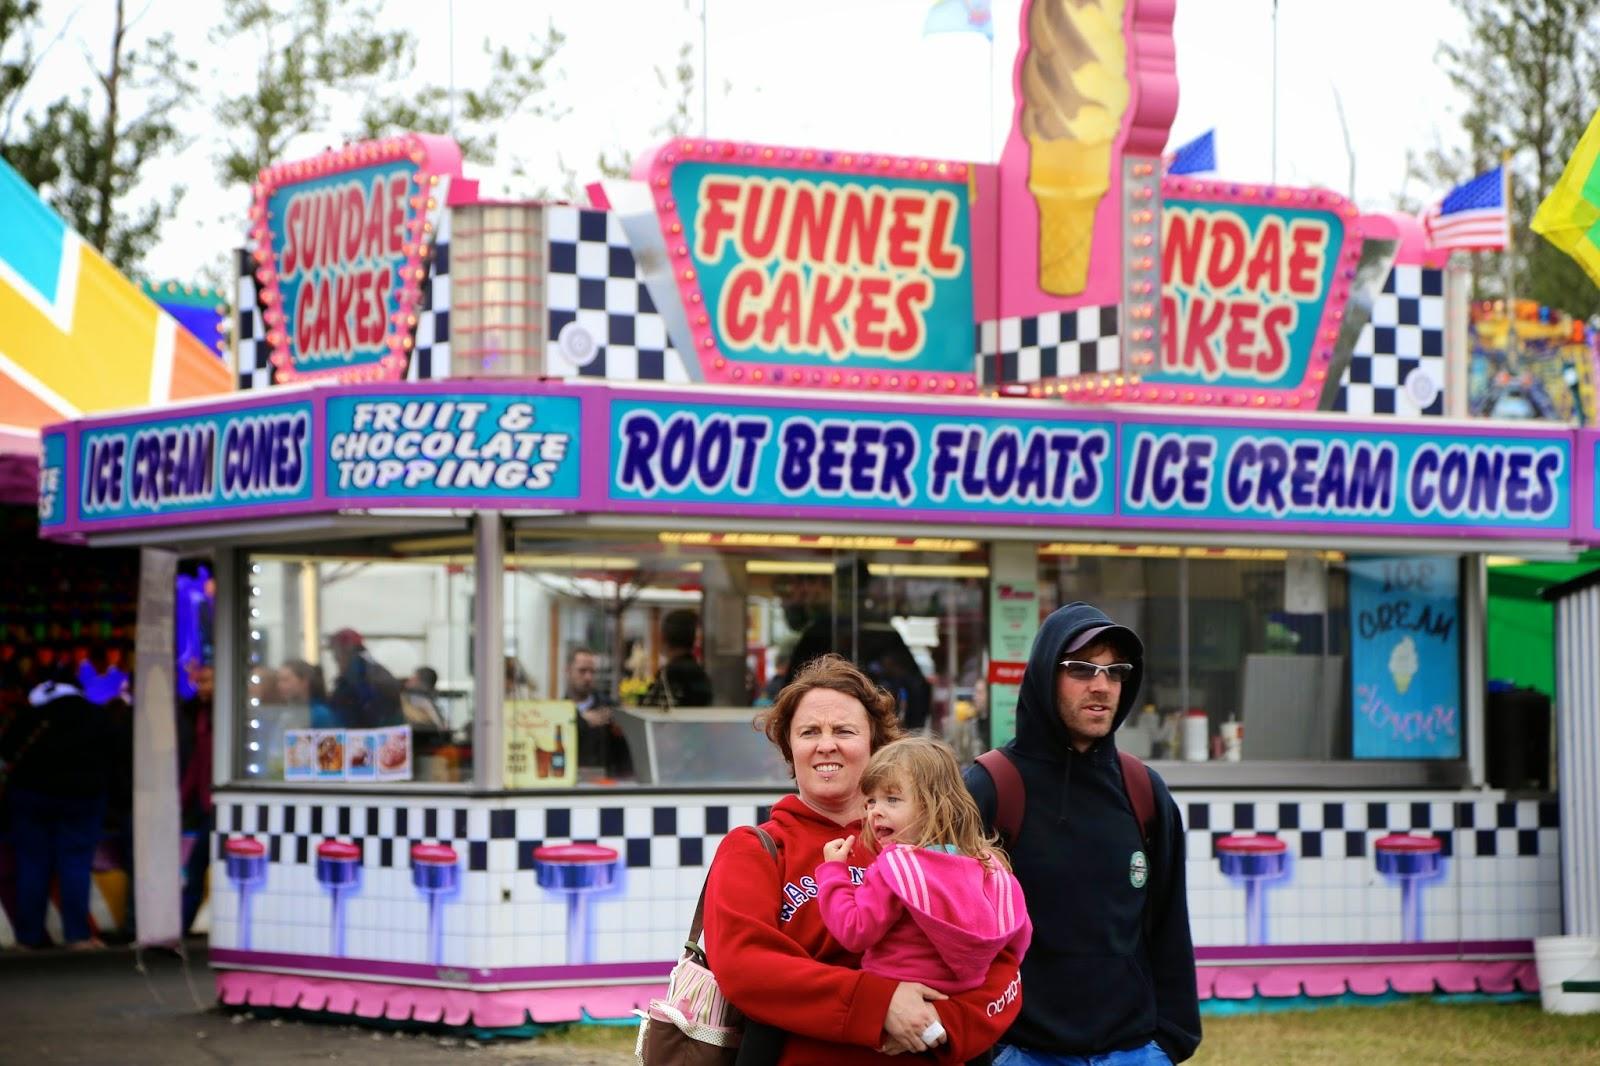 Funnel cake stall, Alaska State Fair